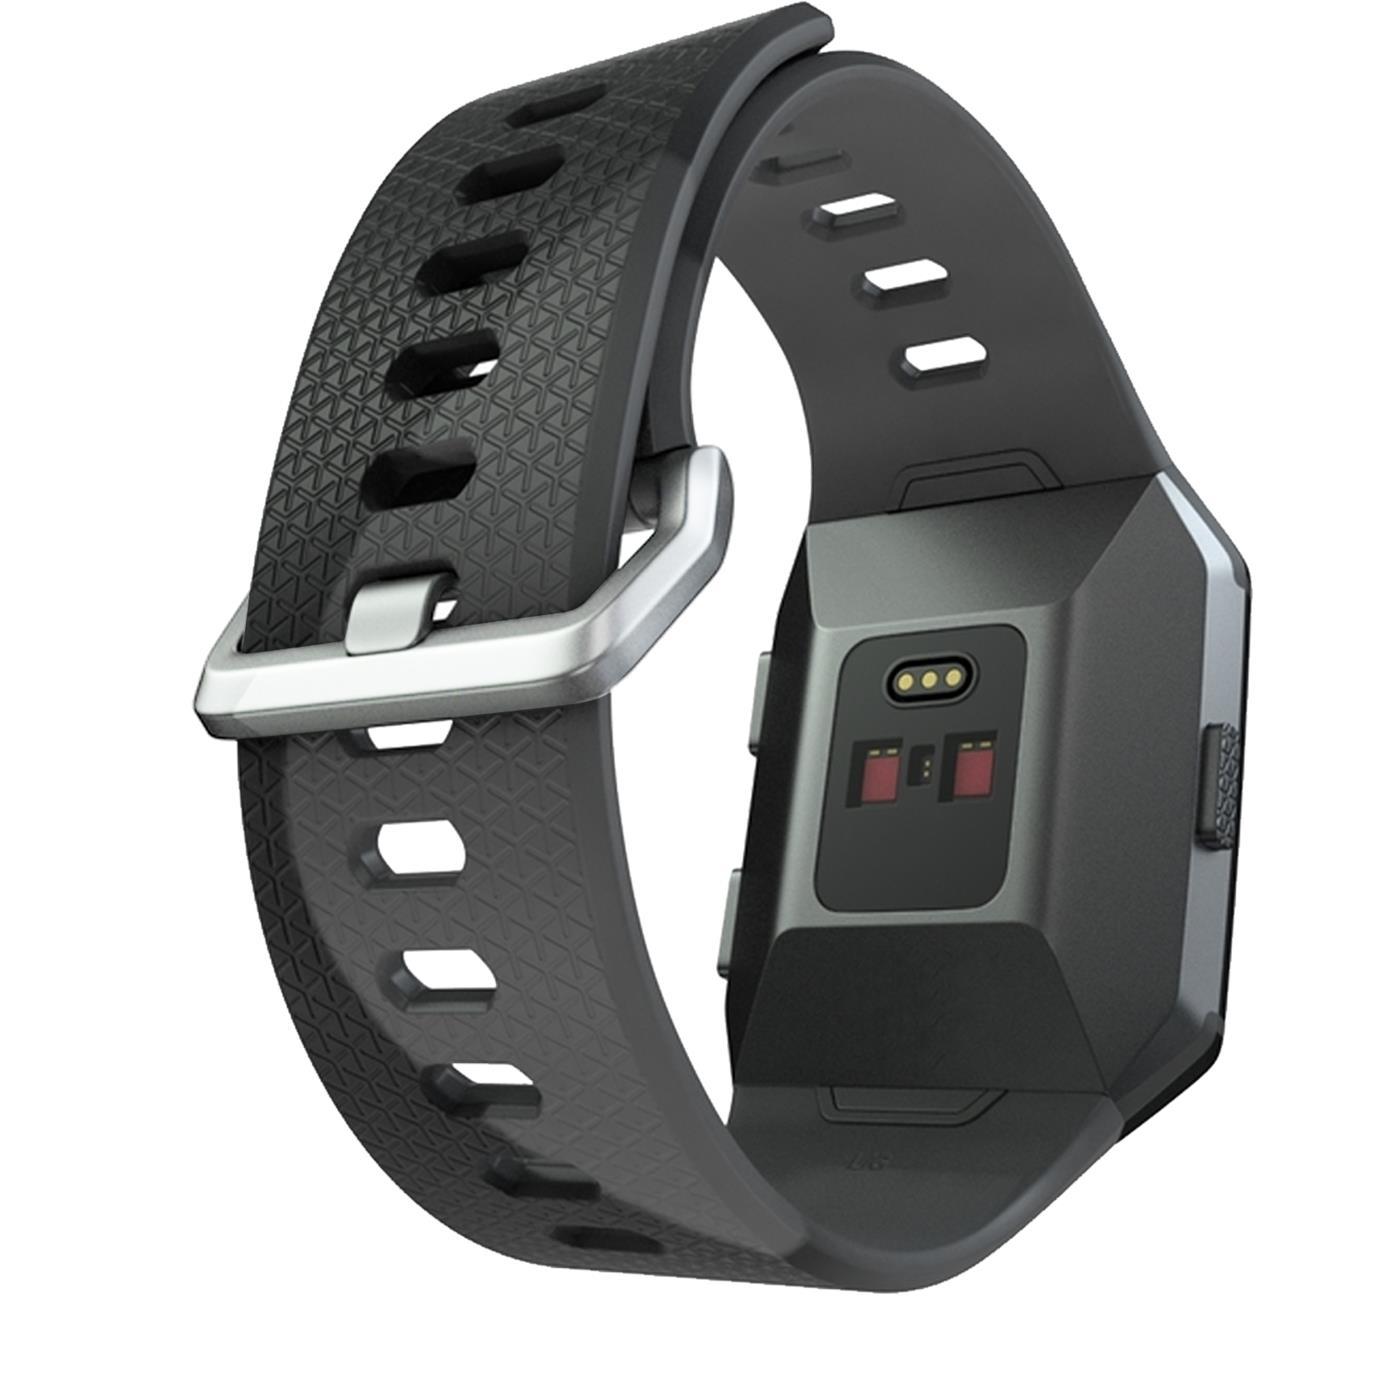 Fitbit-Groesse-S-oder-L-Ersatz-Silikon-Armband-Uhren-Sport-Band-Fitness-Tracker Indexbild 31